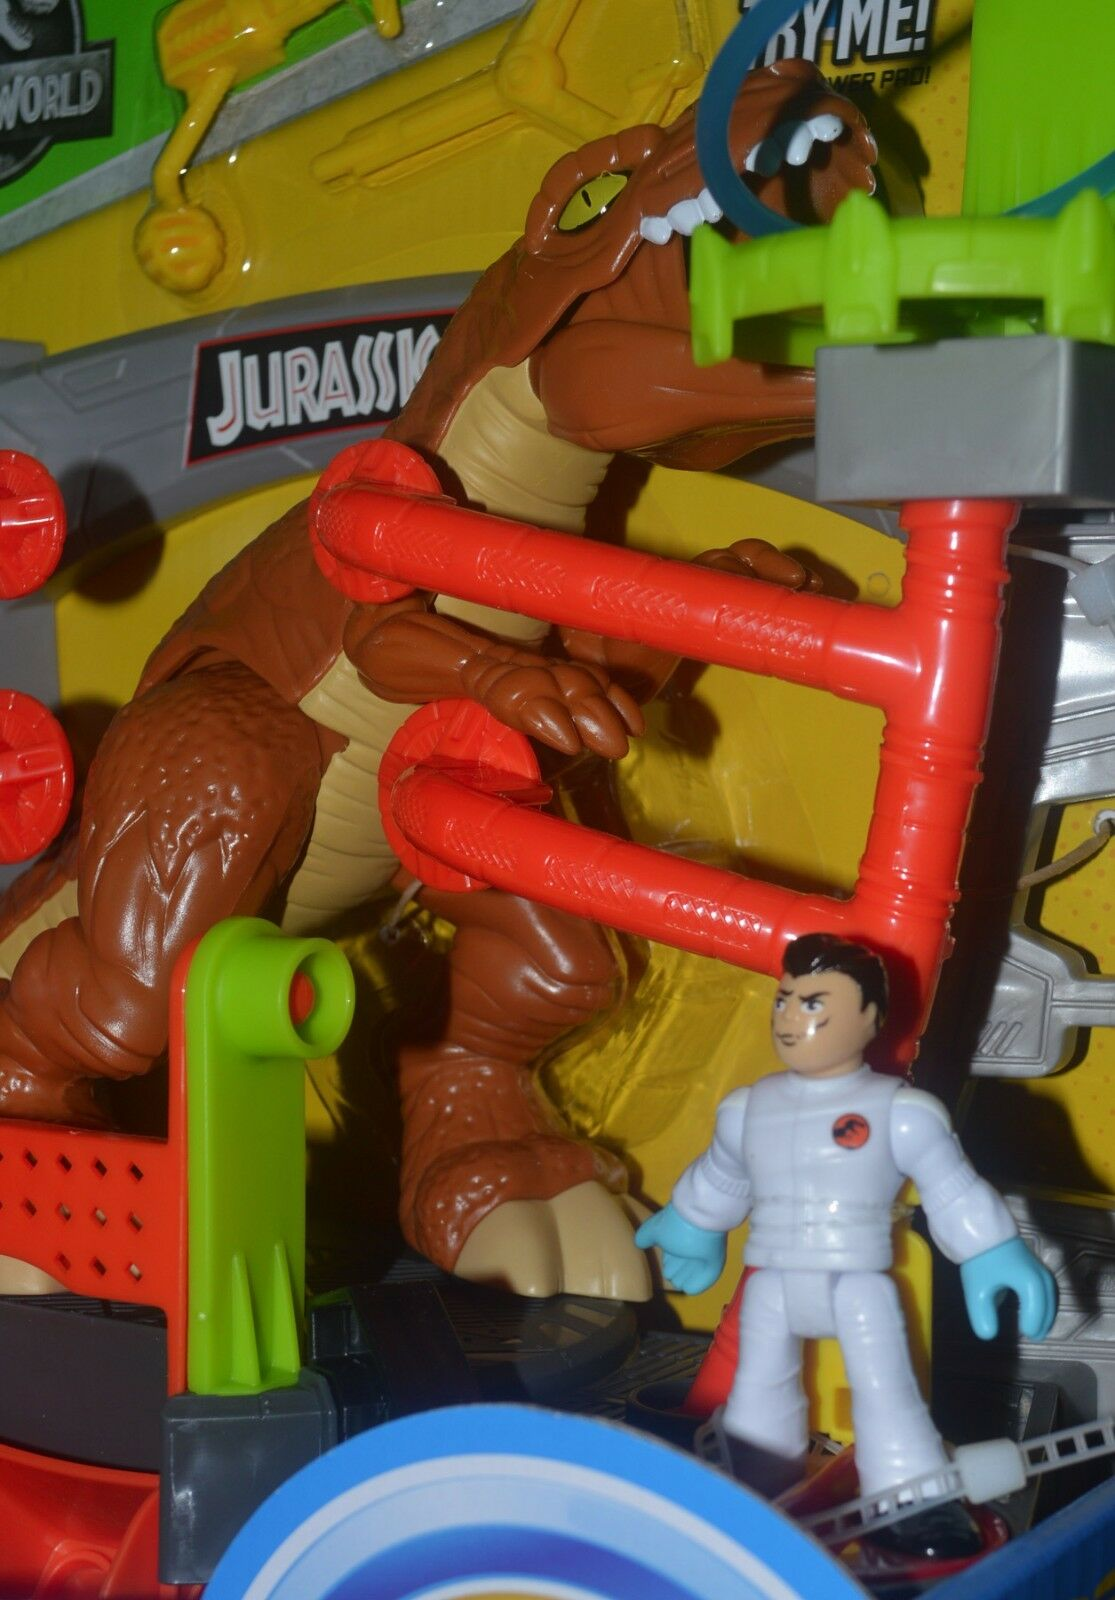 Jurassic World RESEACH RESEACH RESEACH LAB & Doctor Figure Imaginext Set Power Pad New  HTF MIP 7add3f